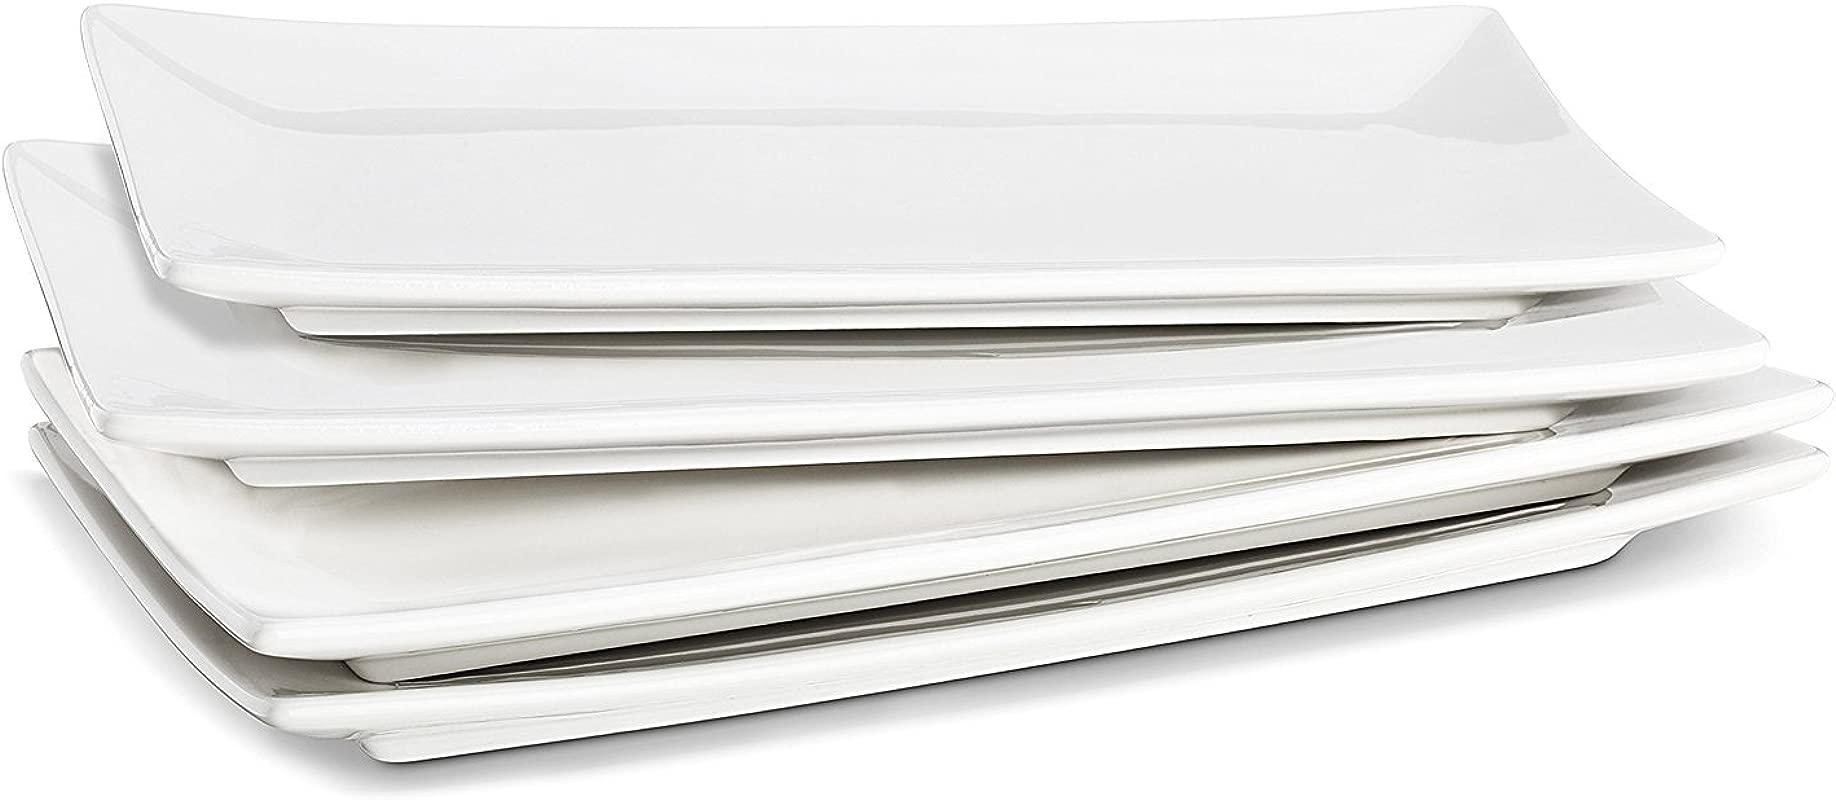 LIFVER 10 Inch Porcelain Serving Platters Rectangular Plates White Set Of 4